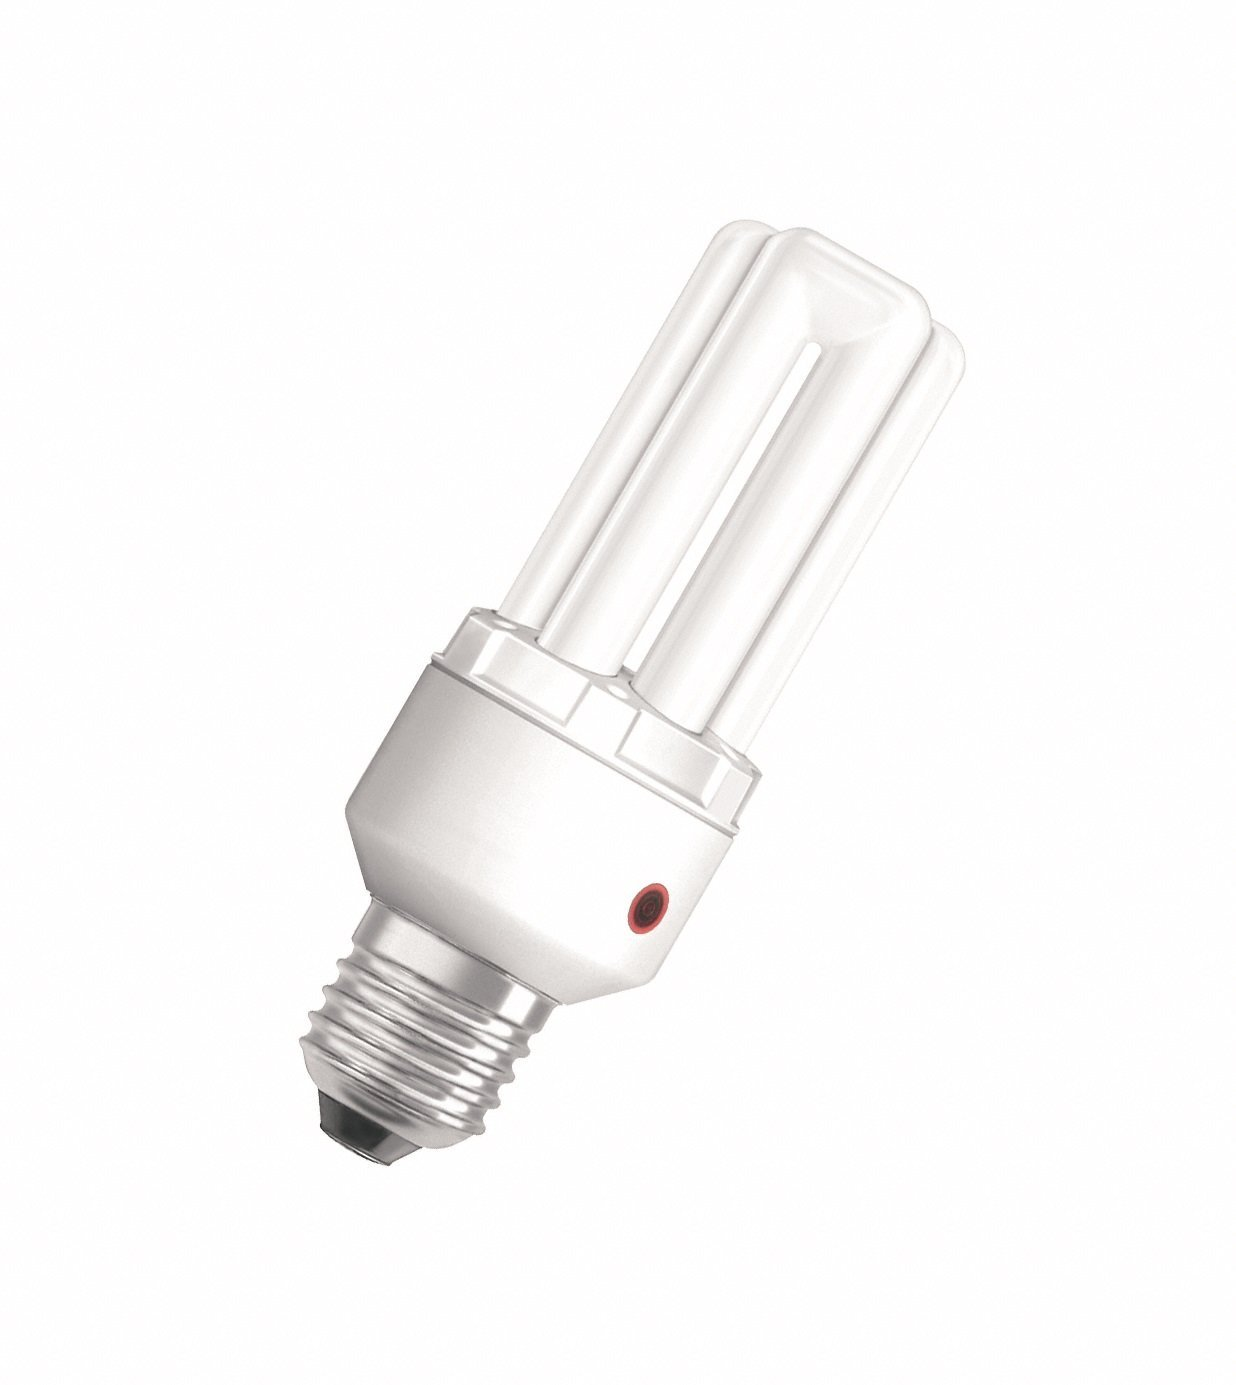 osram dulux 15w dusk to dawn sensor es e27 light bulb low energy day night lamp ebay. Black Bedroom Furniture Sets. Home Design Ideas